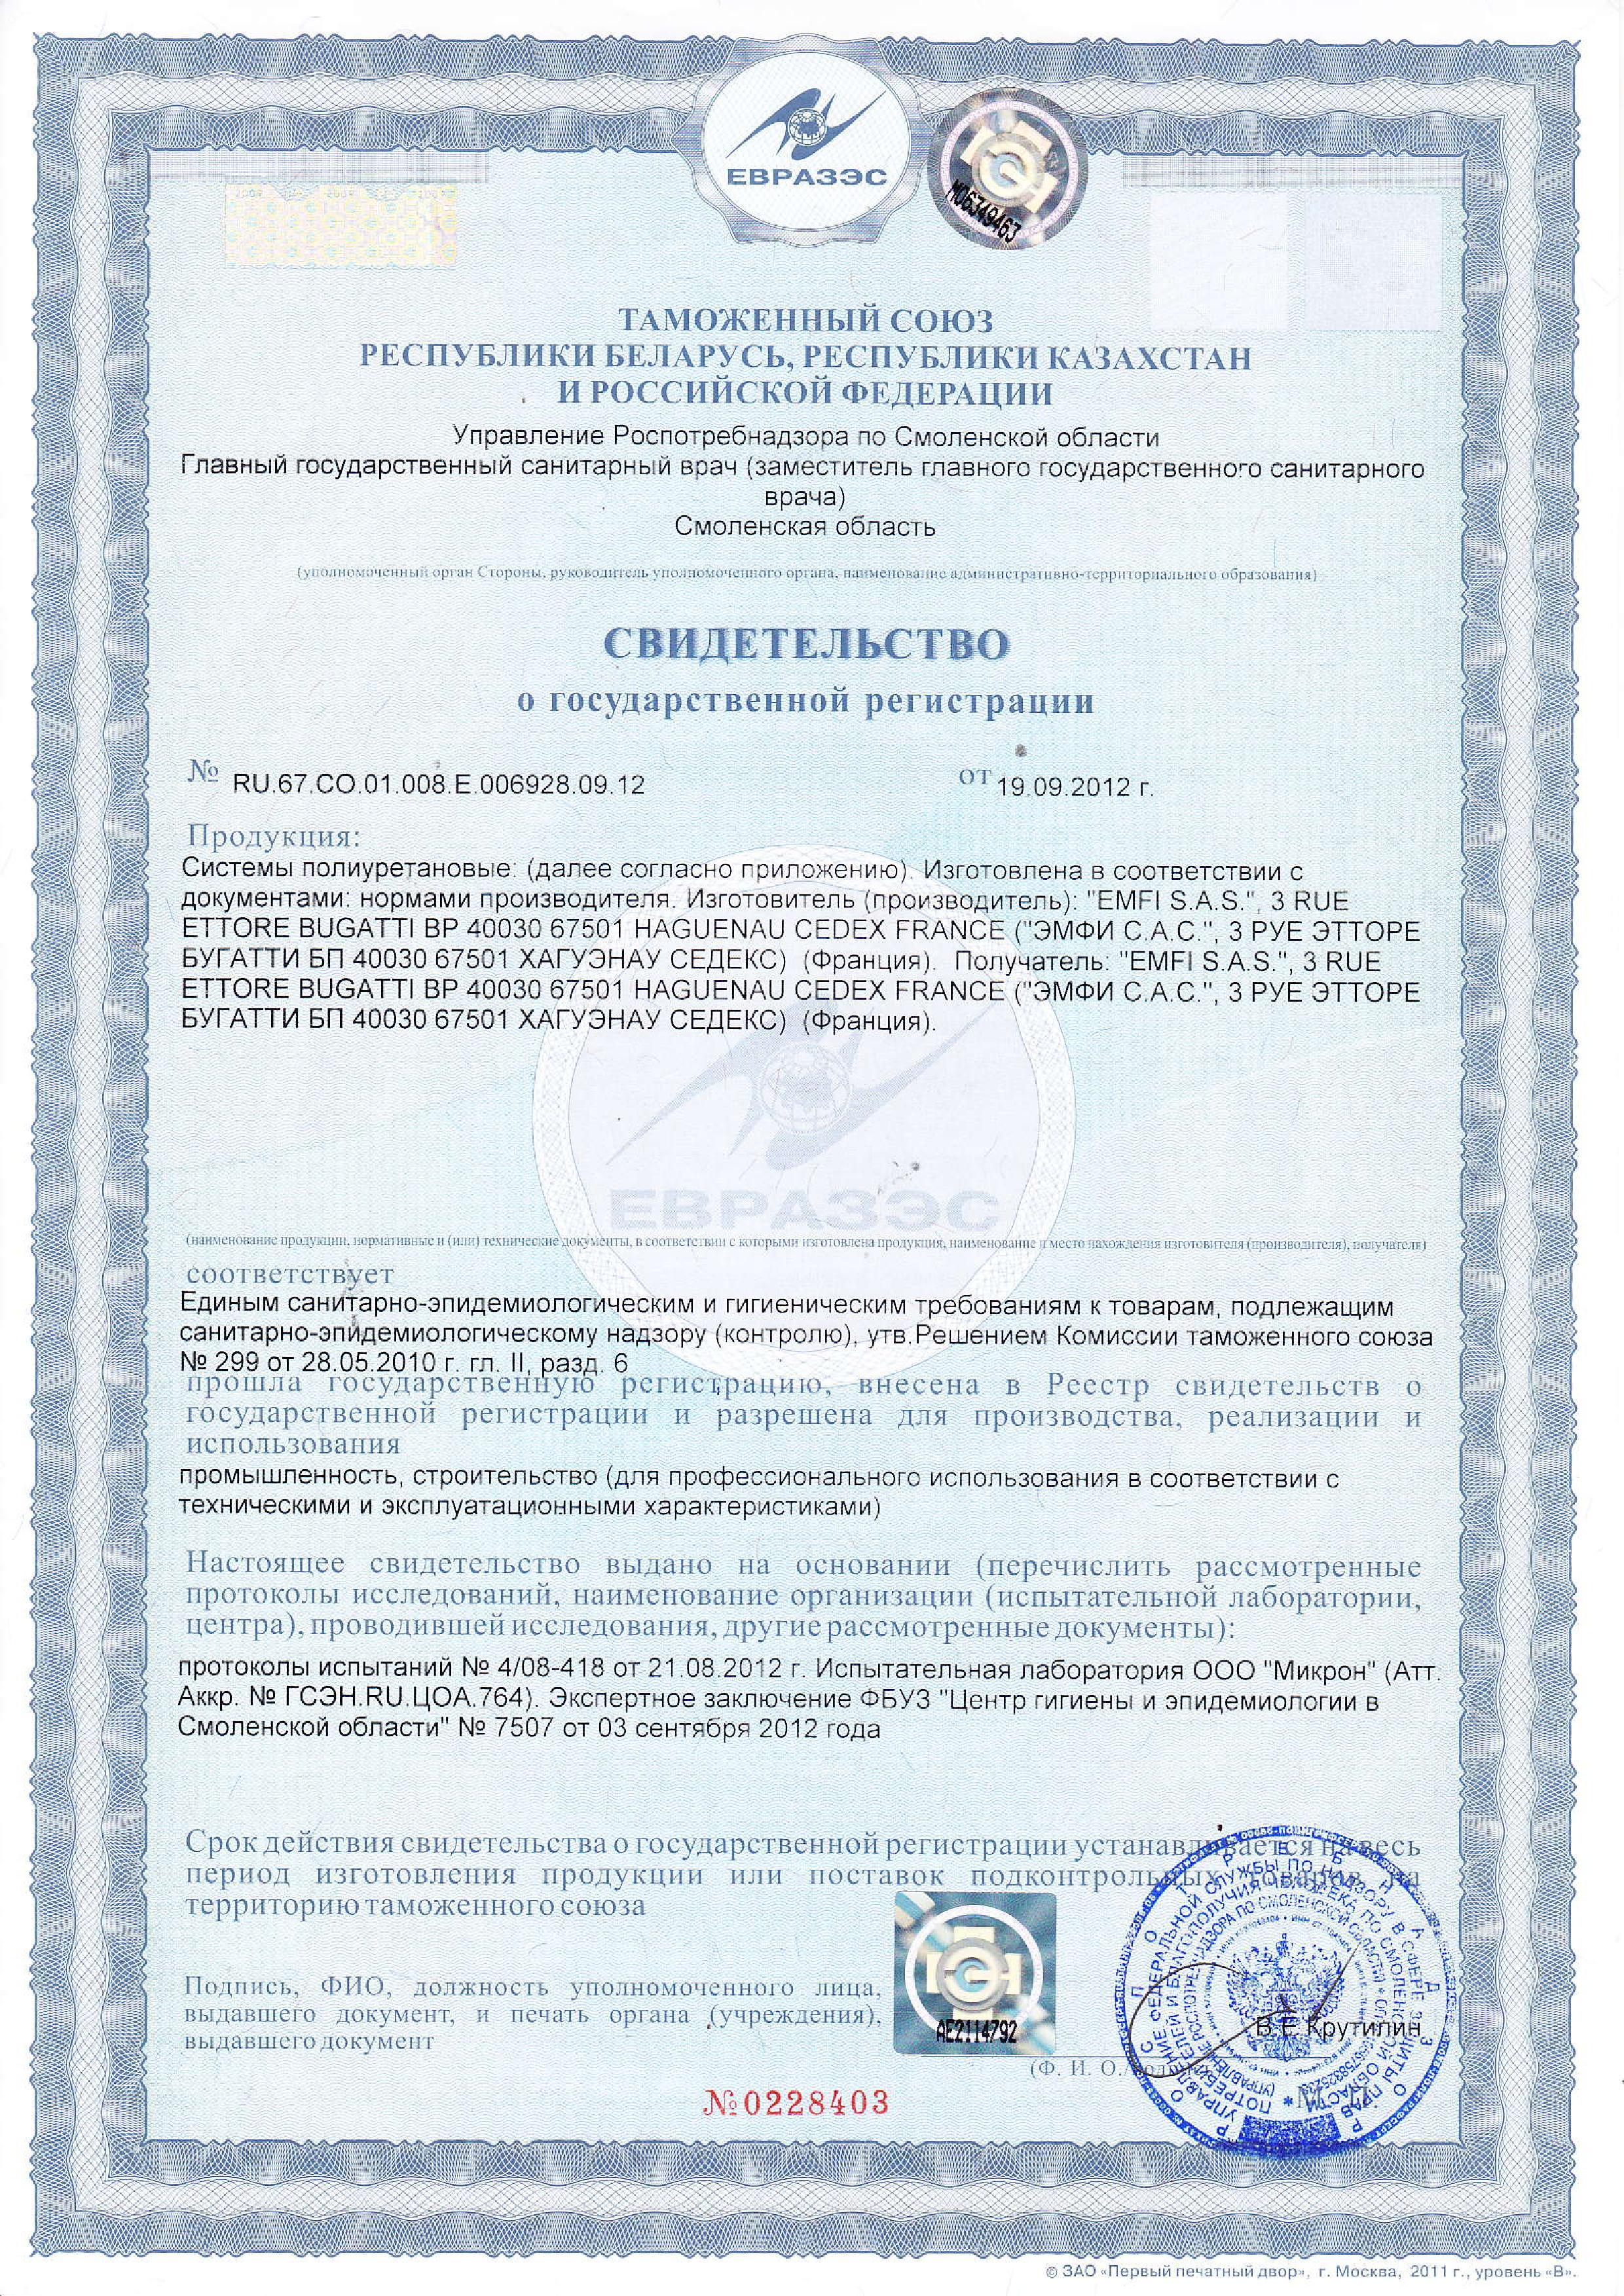 Kl_Poliuretan_System_GosRegGigien_otSept12-page-001